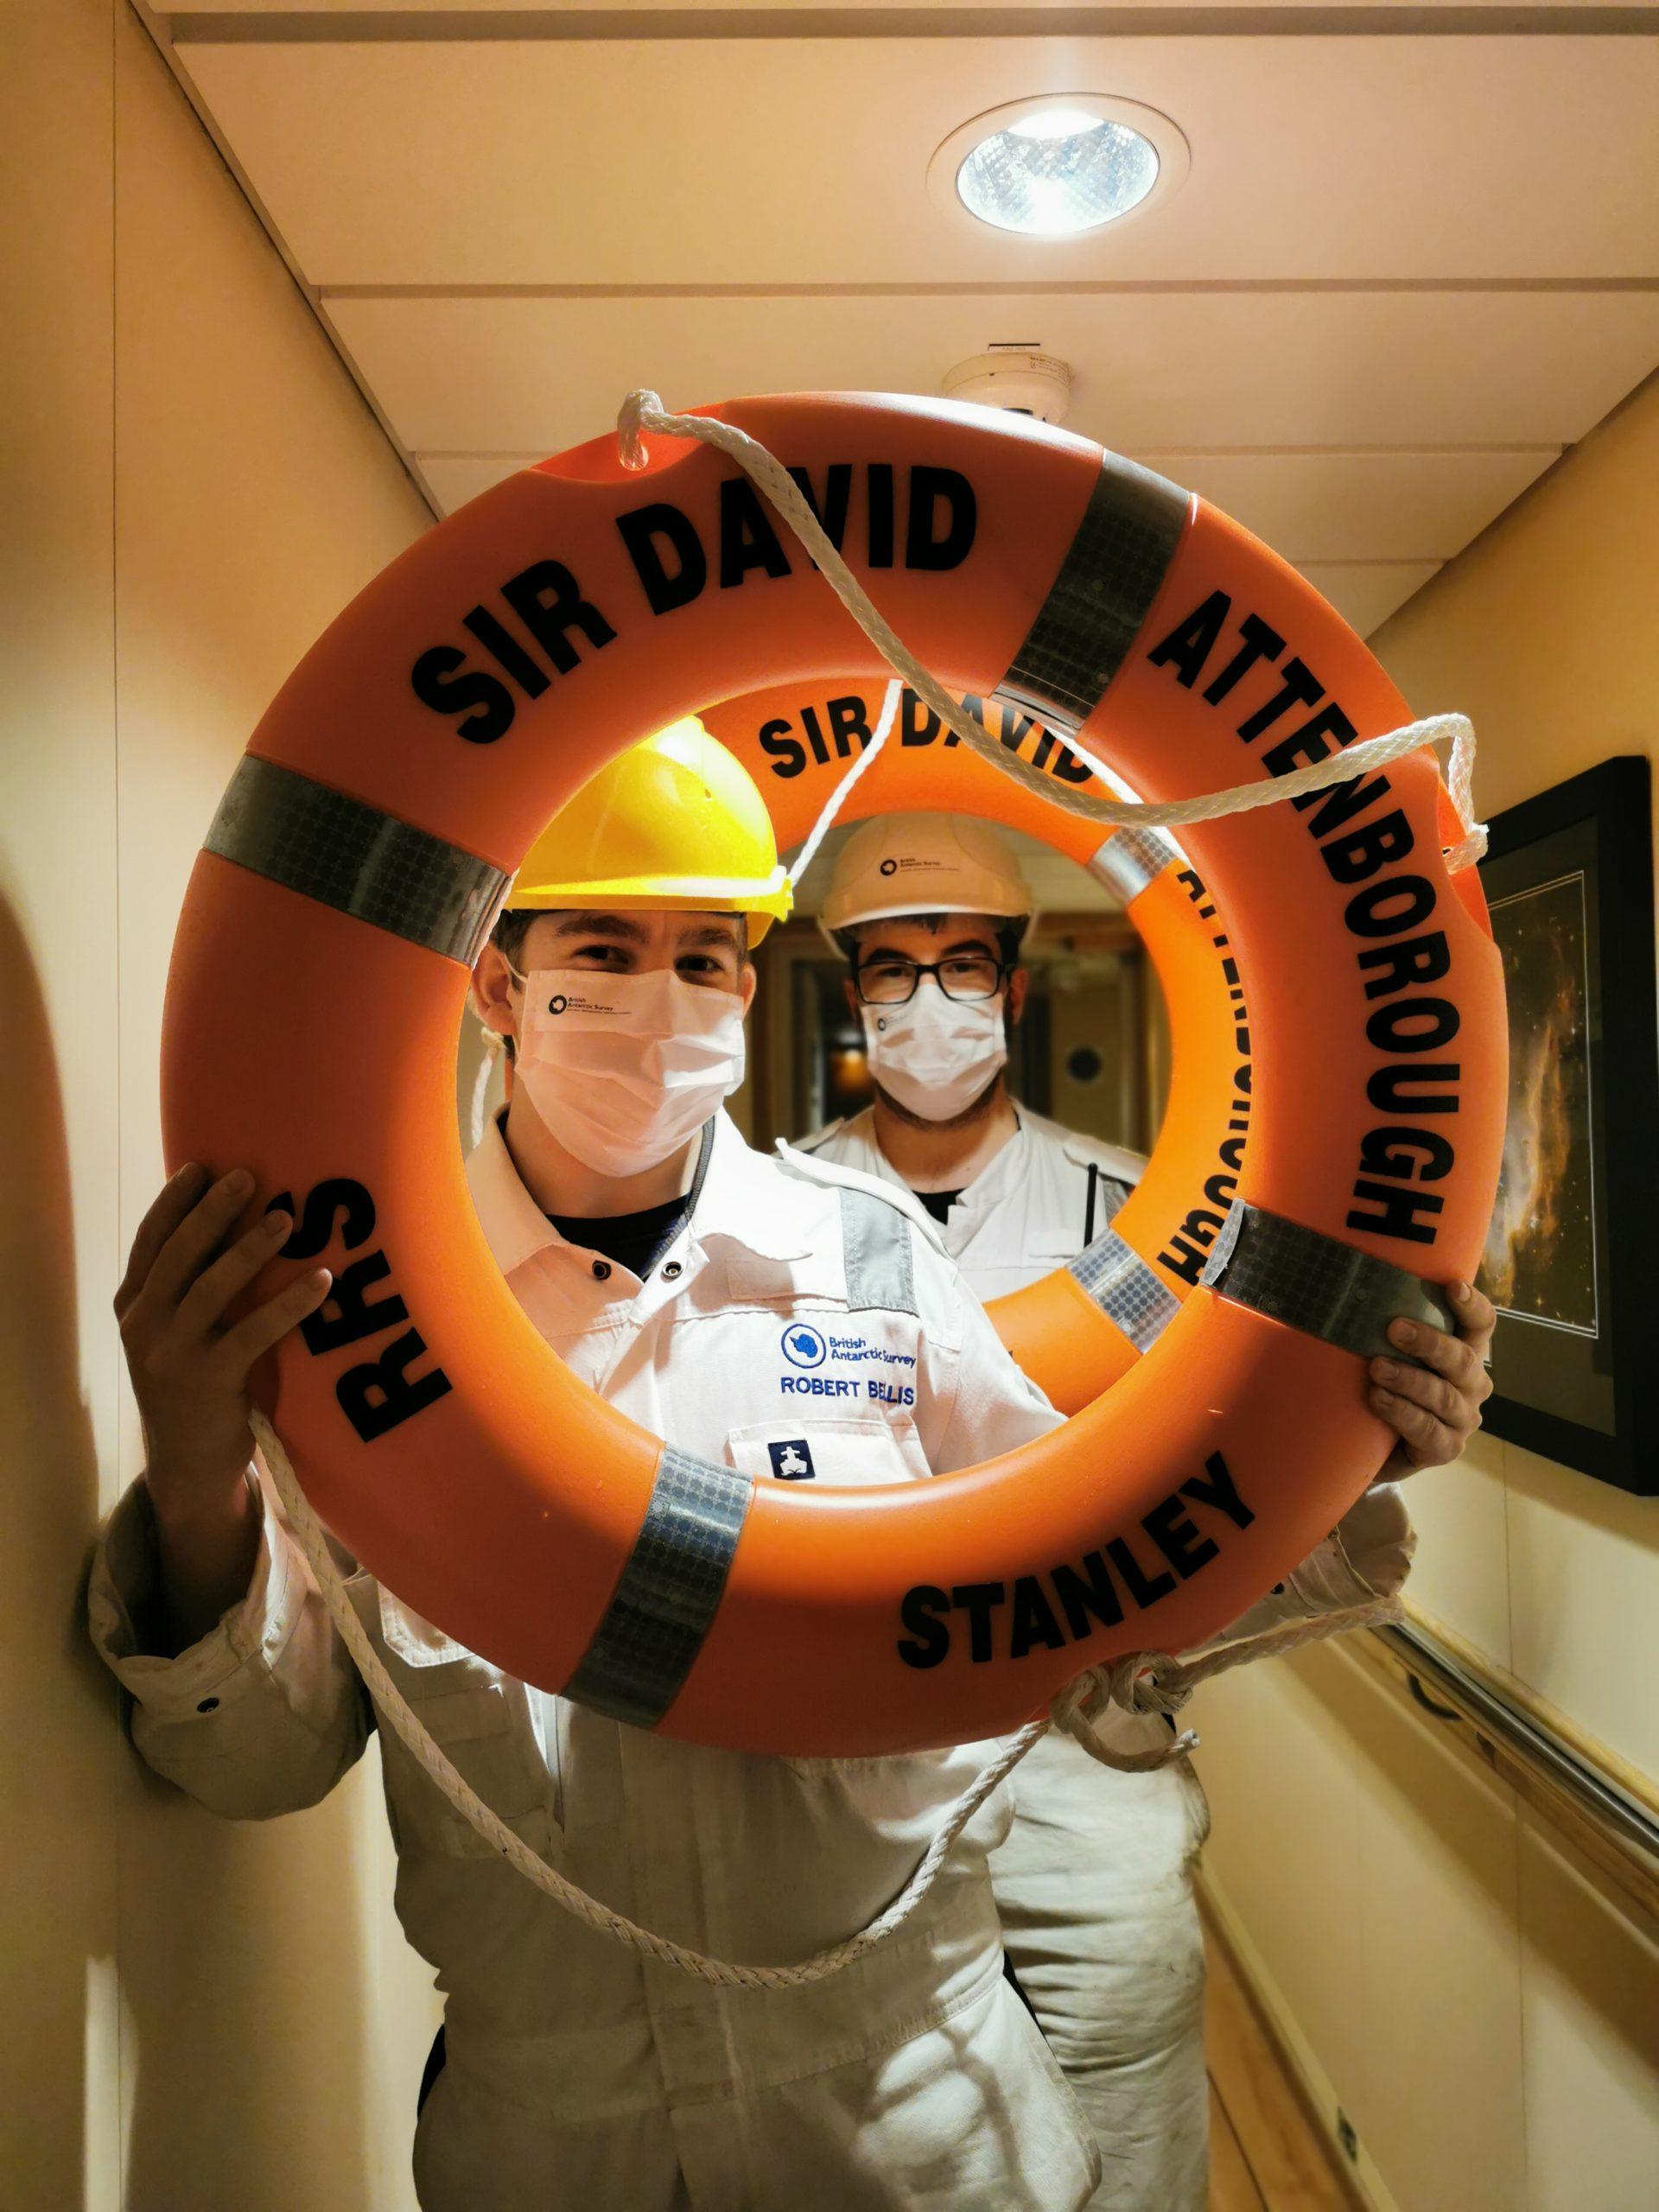 Two men in hard hats poke their faces through an orange life ring